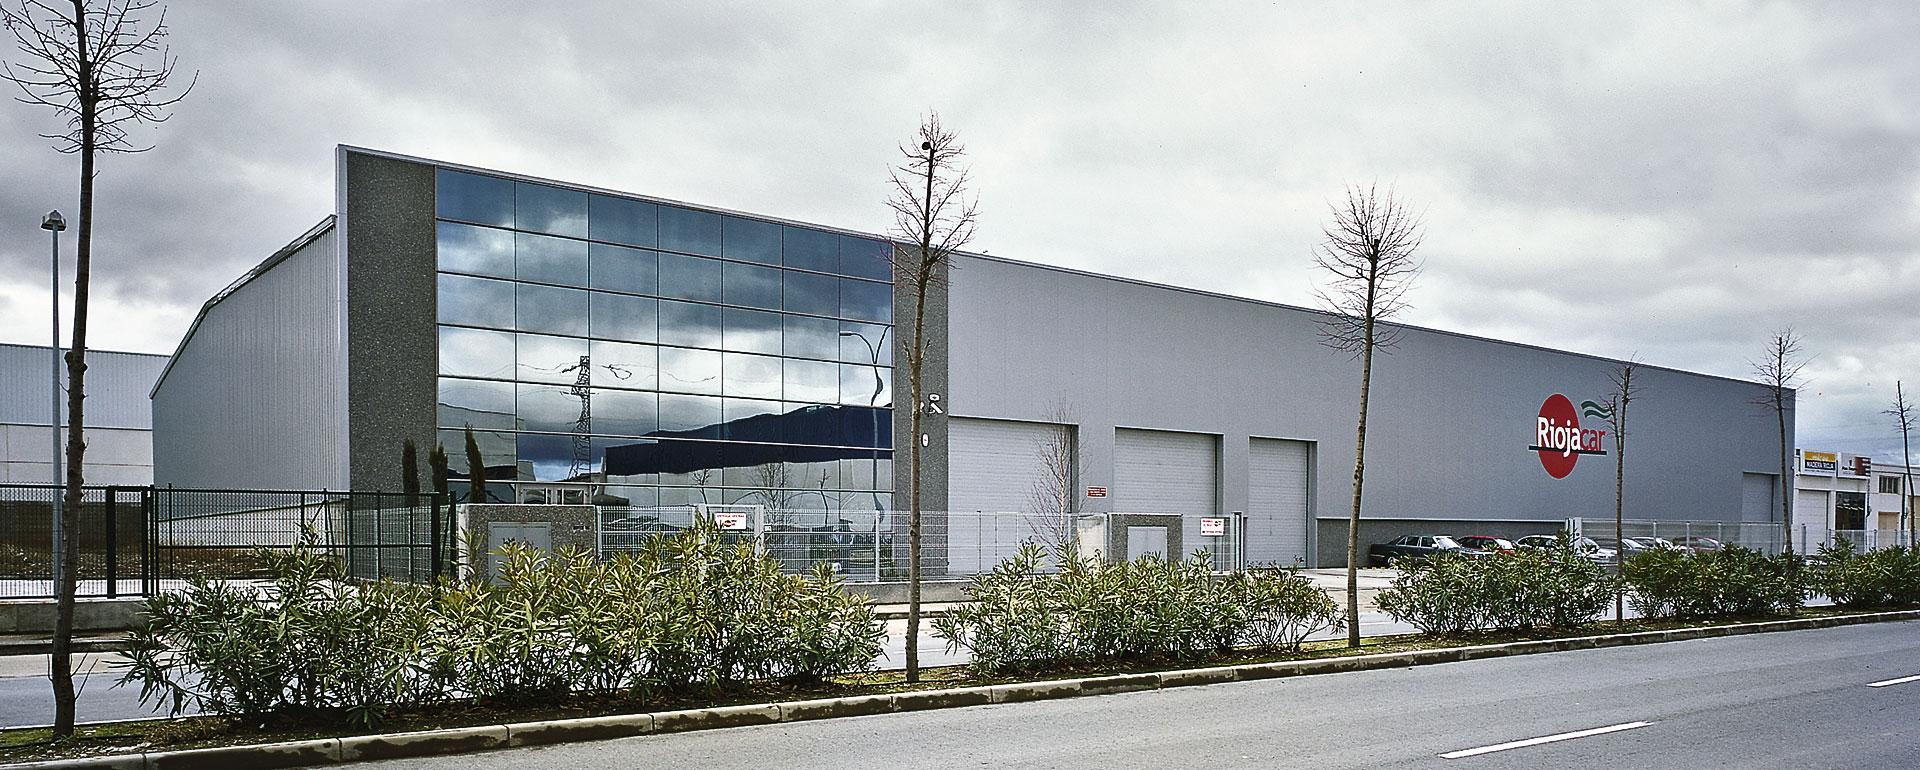 Exterior de la empresa Autocares Riojacar